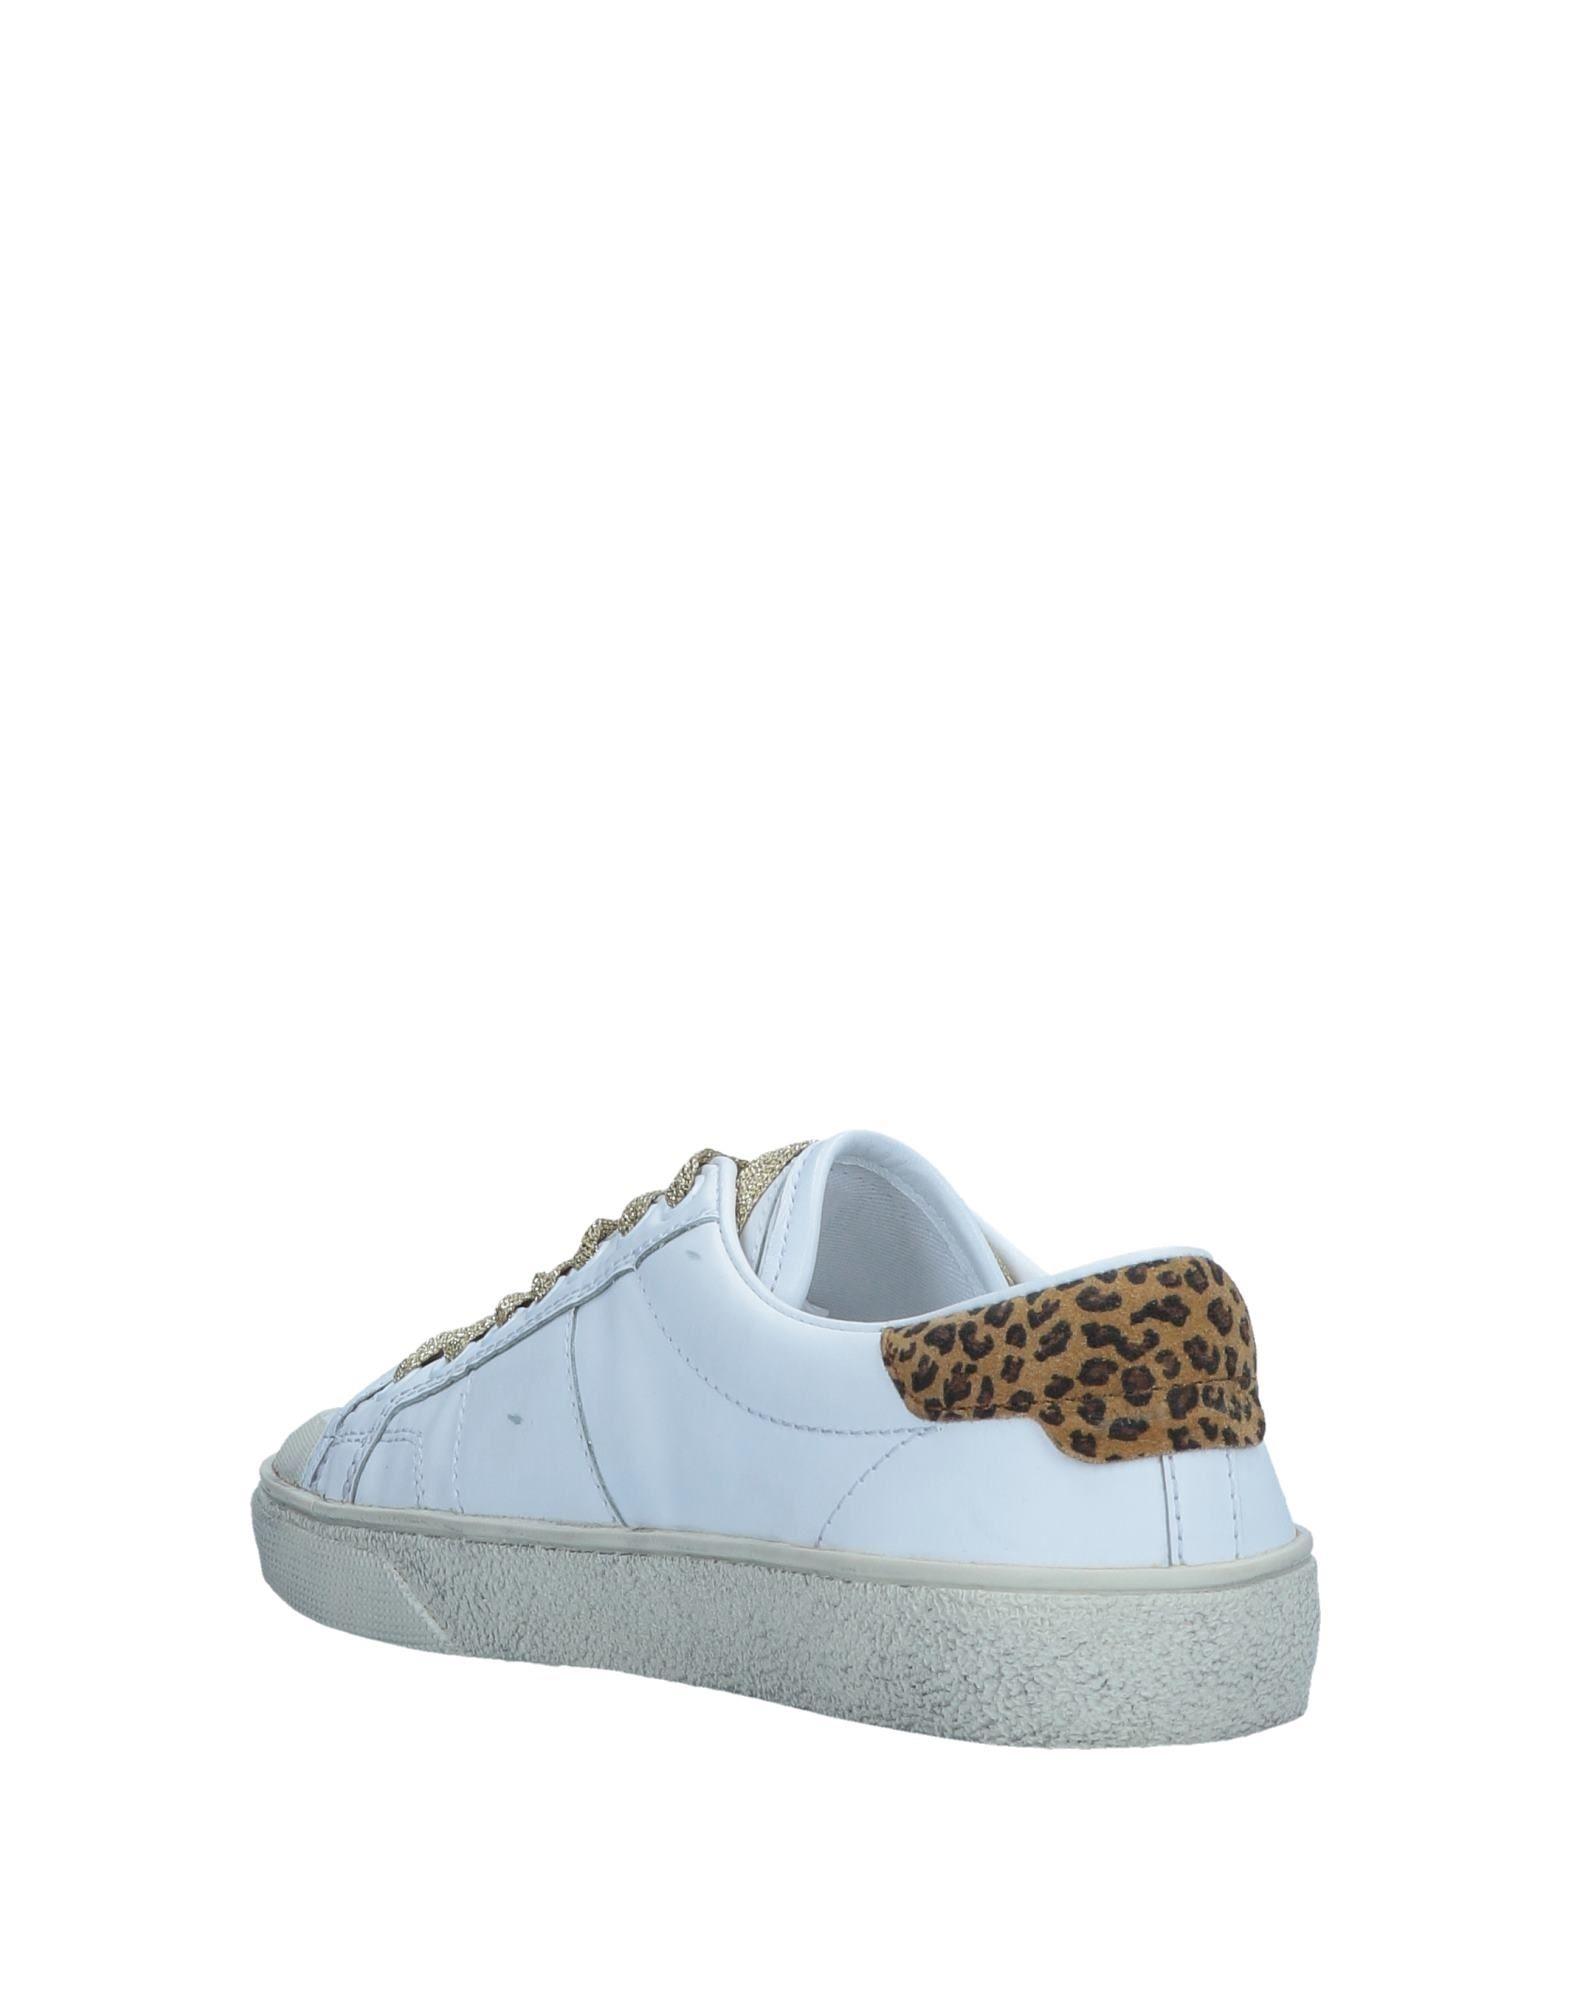 Rabatt Damen Schuhe Saint Laurent Sneakers Damen Rabatt  11558047VC b51491